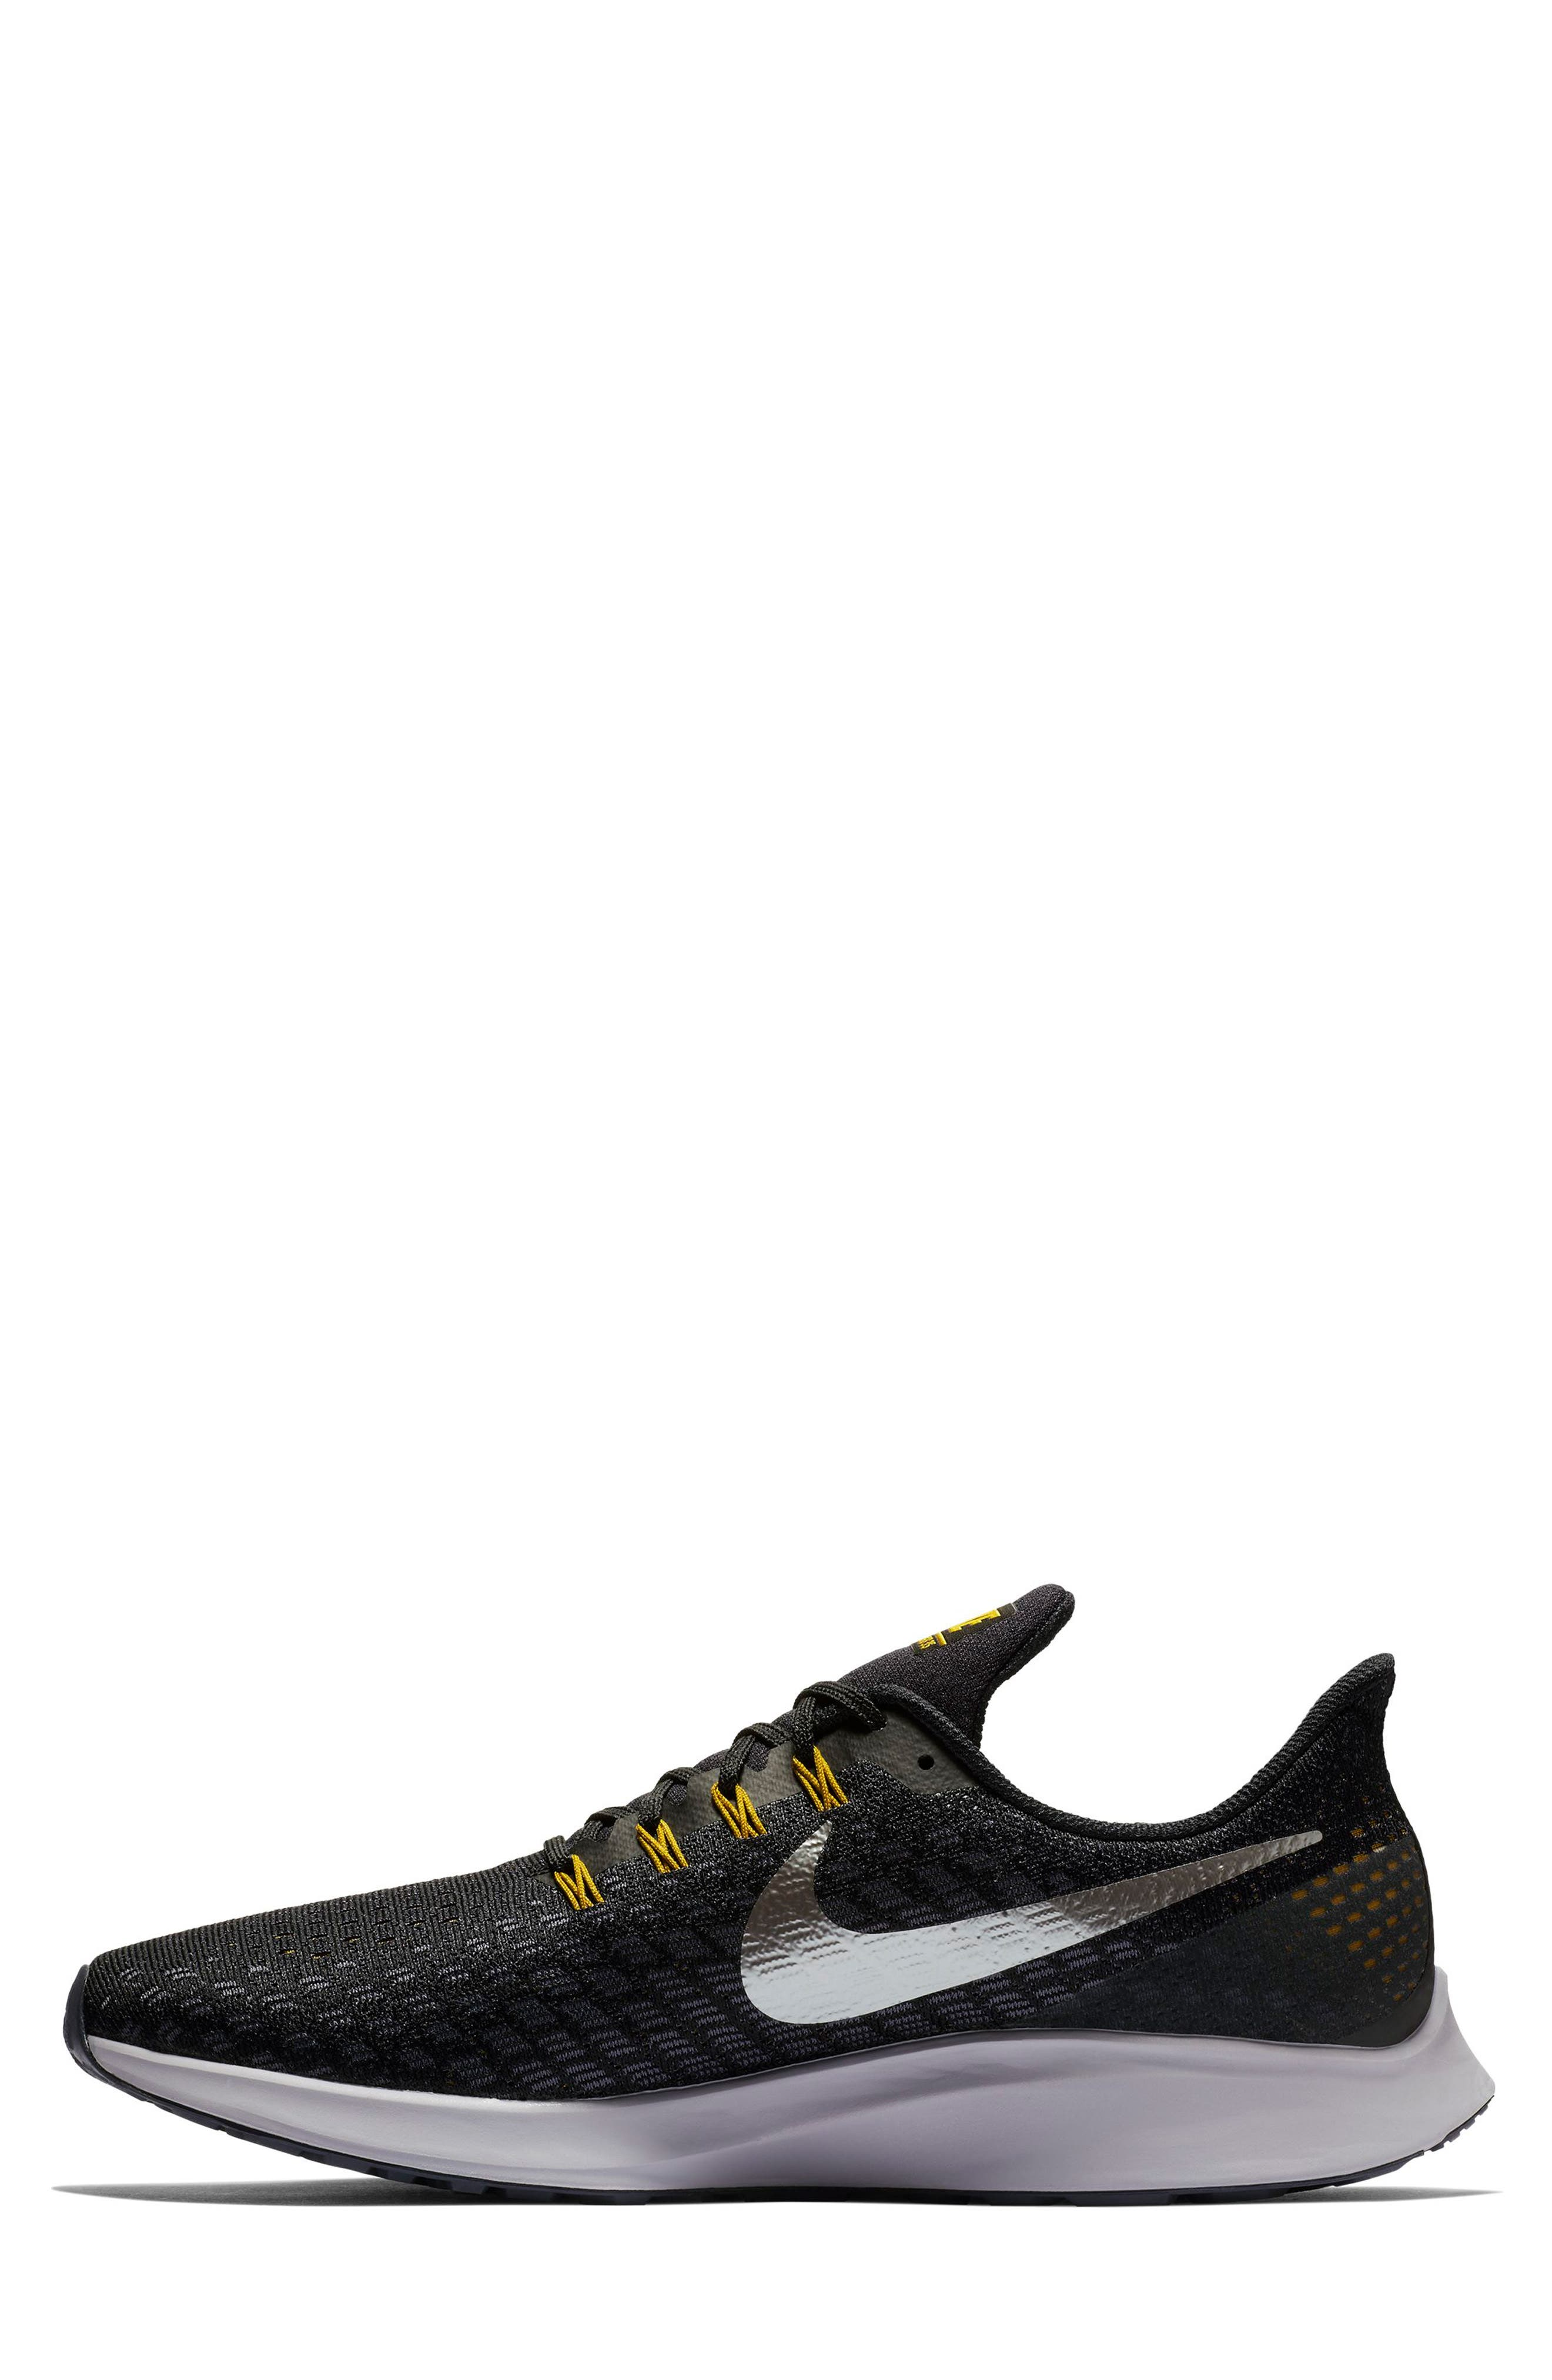 Air Zoom Pegasus 35 Running Shoe,                             Alternate thumbnail 7, color,                             BLACK/ PEWTER/ MOSS